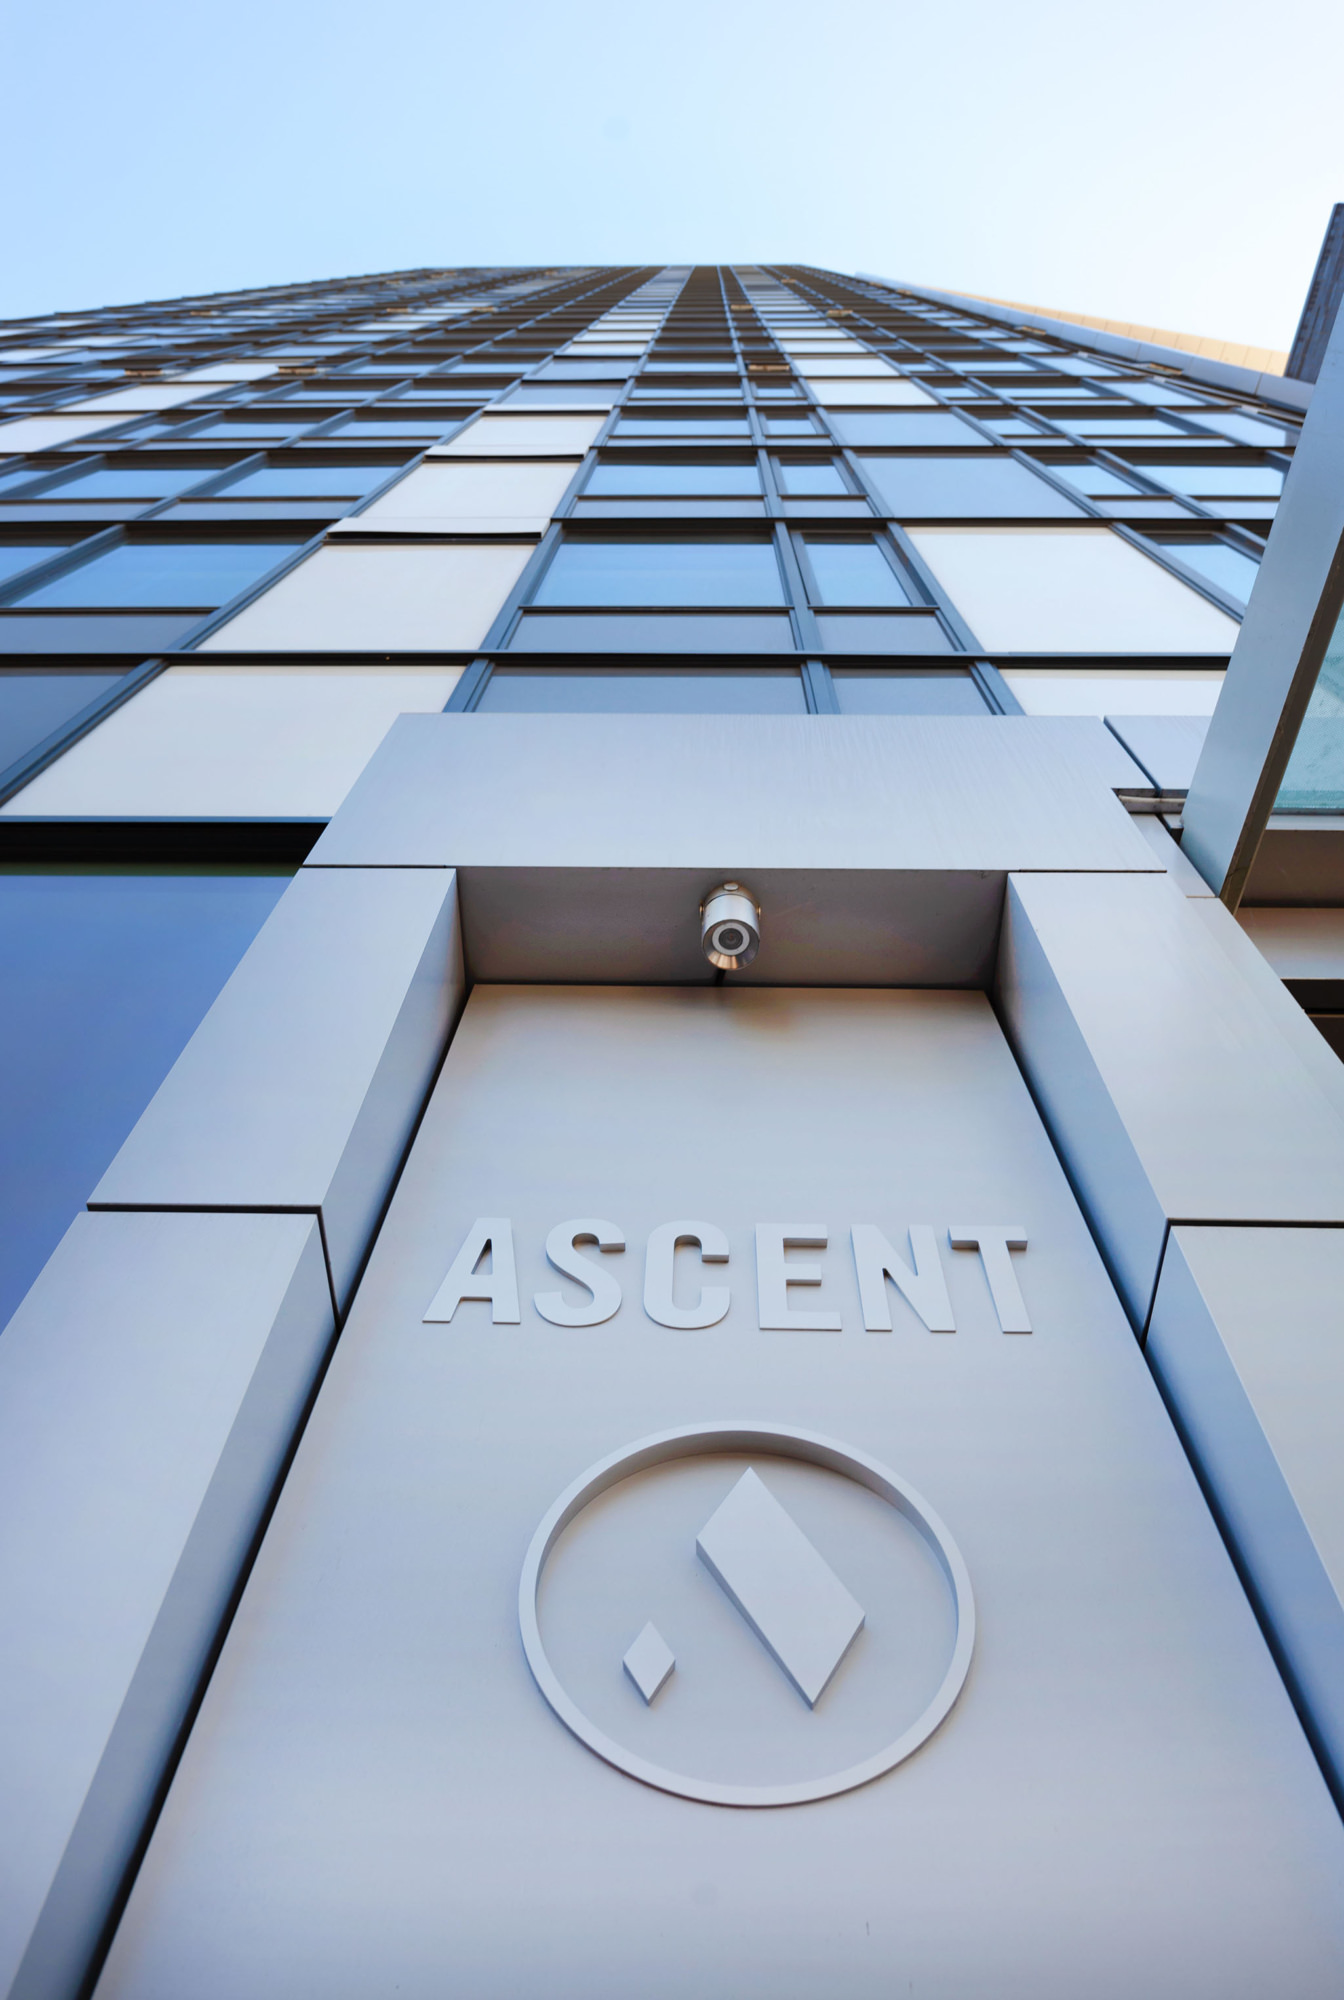 Ascent signage